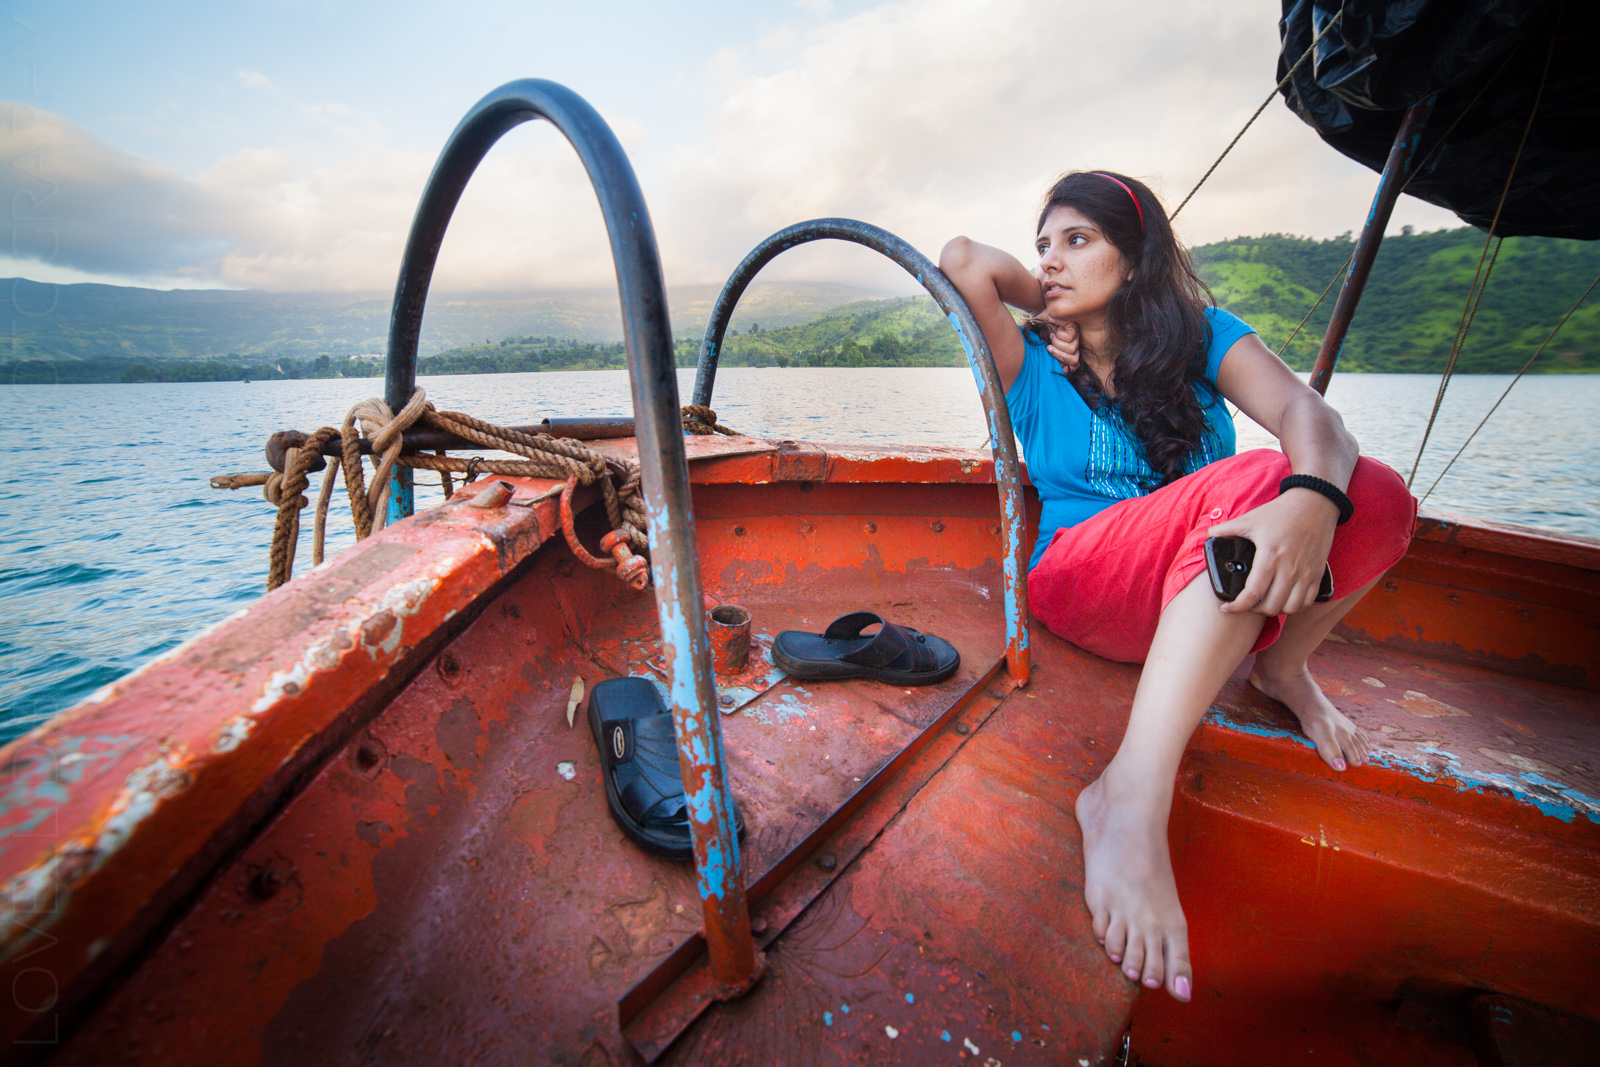 Priya Ramachandran at Bamnoli